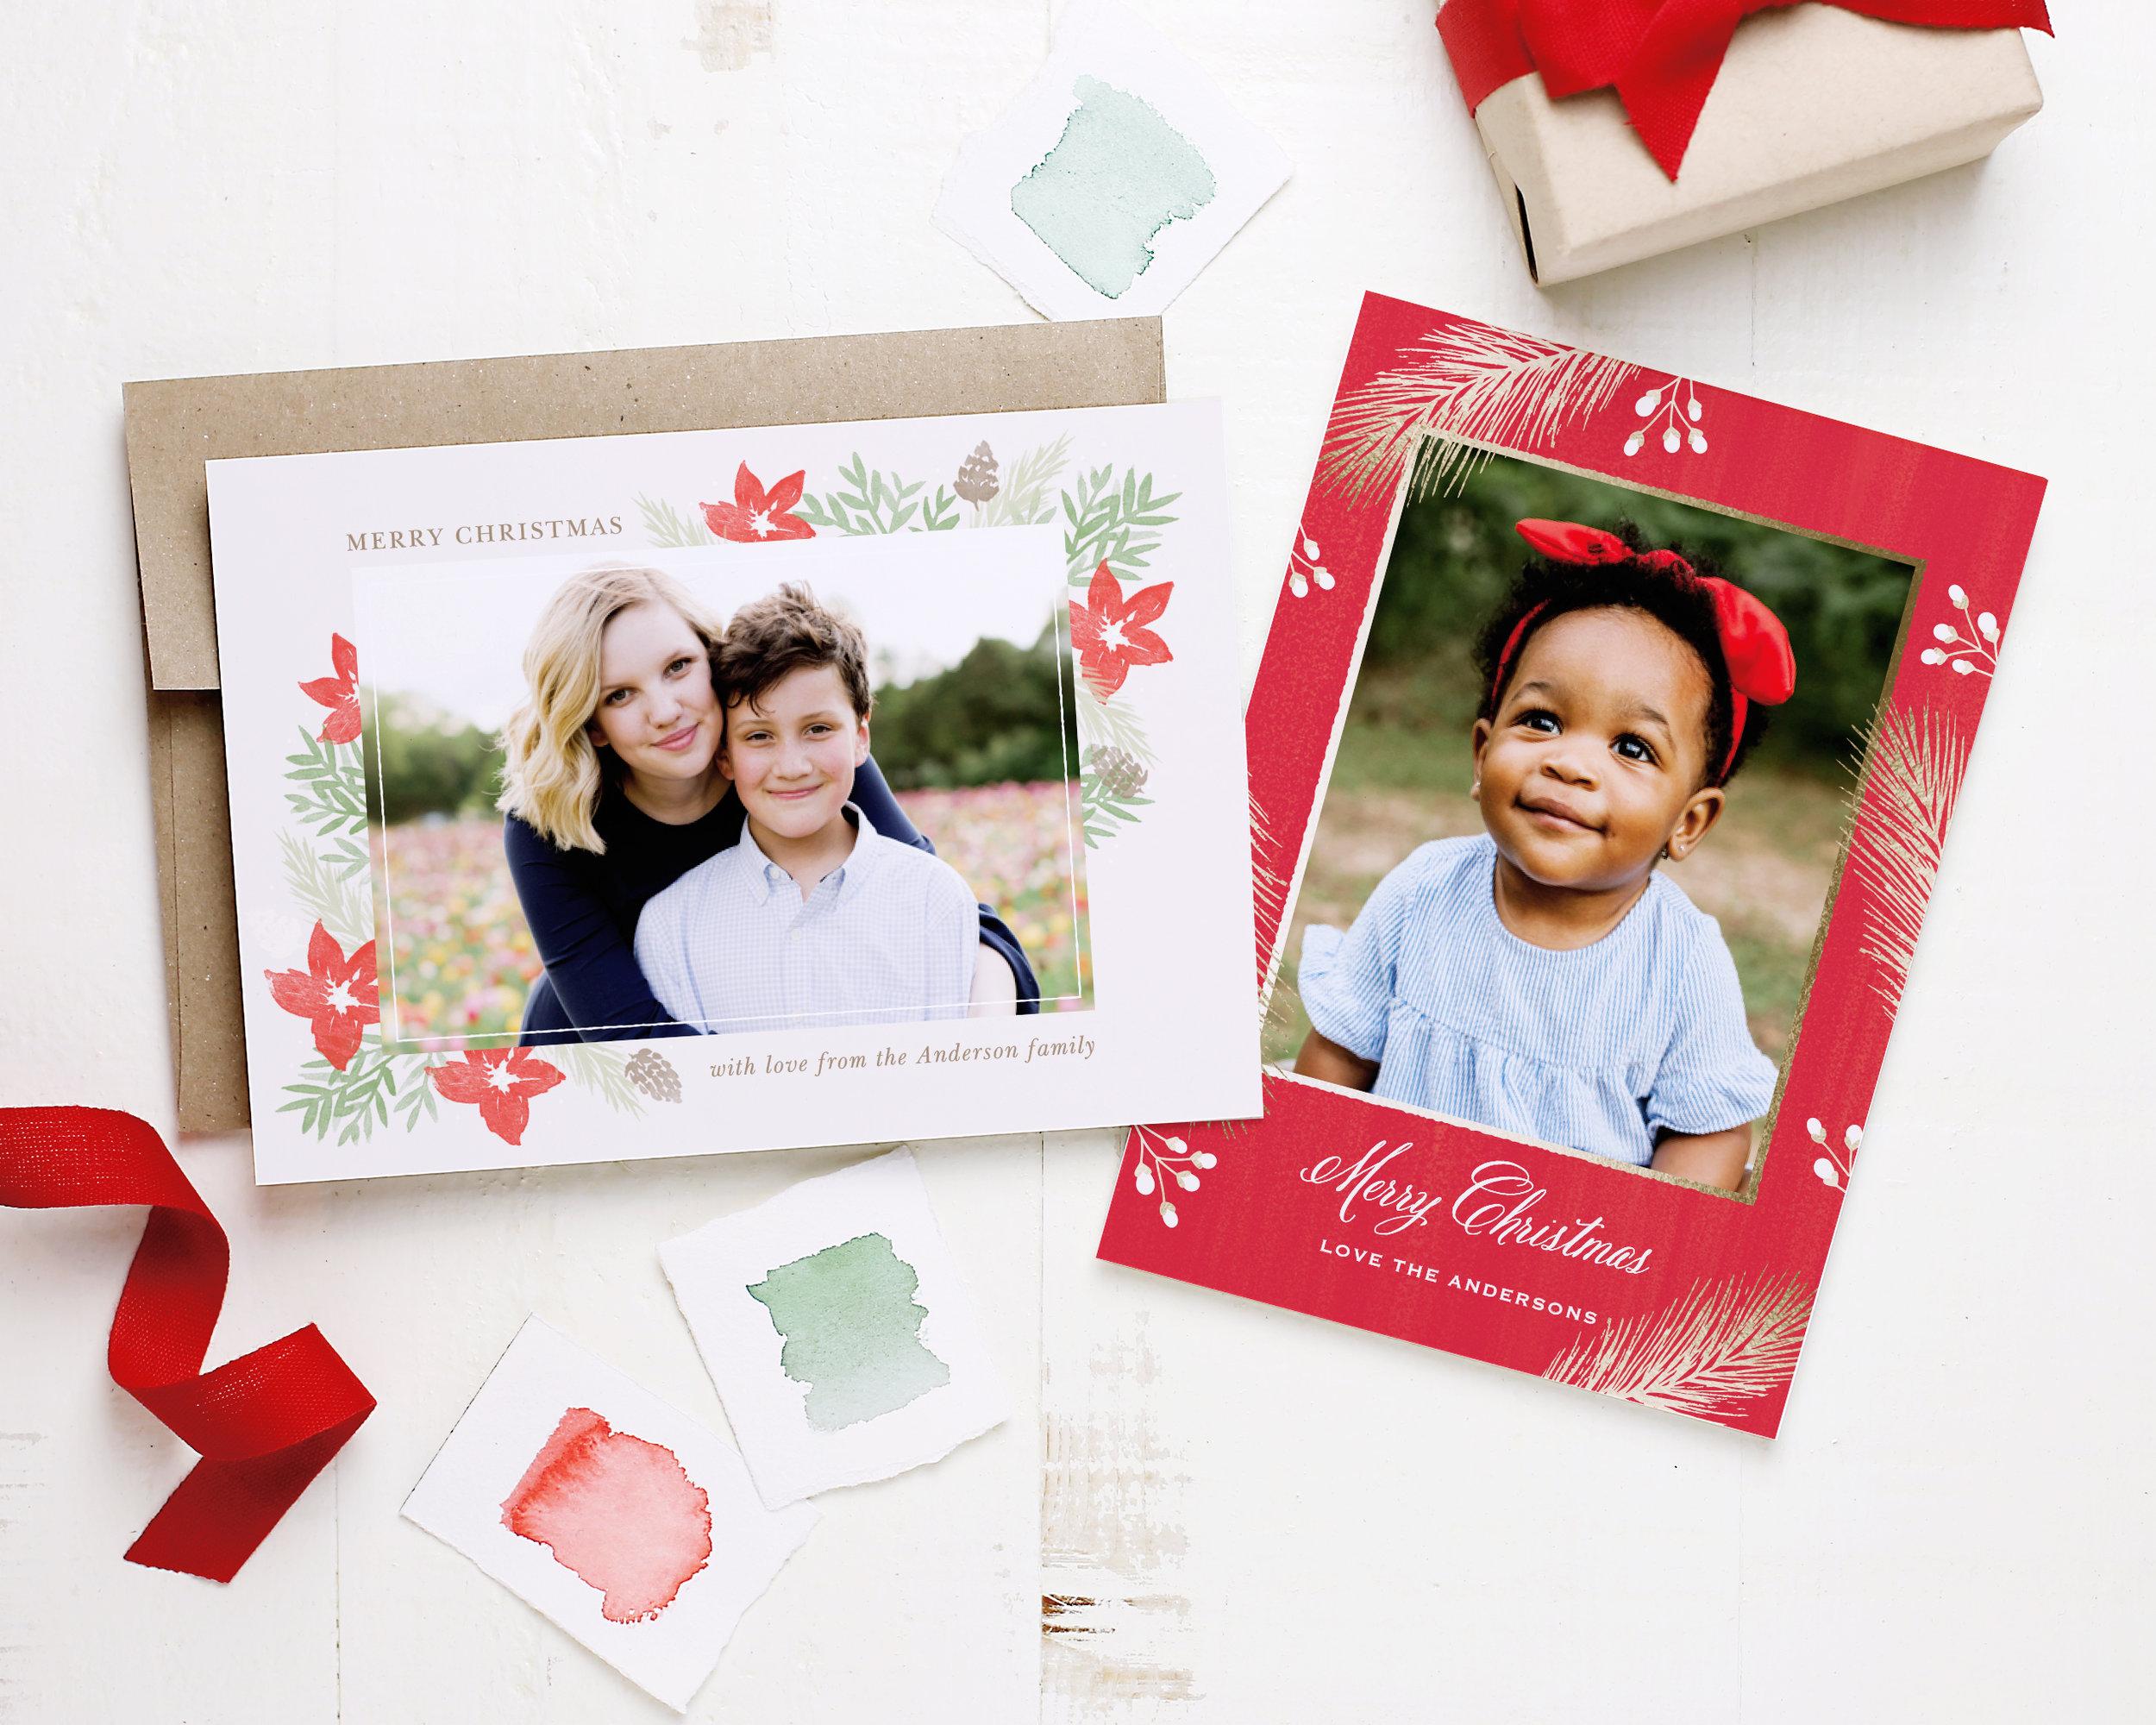 Basic_Invite_holiday_cards_4.jpg